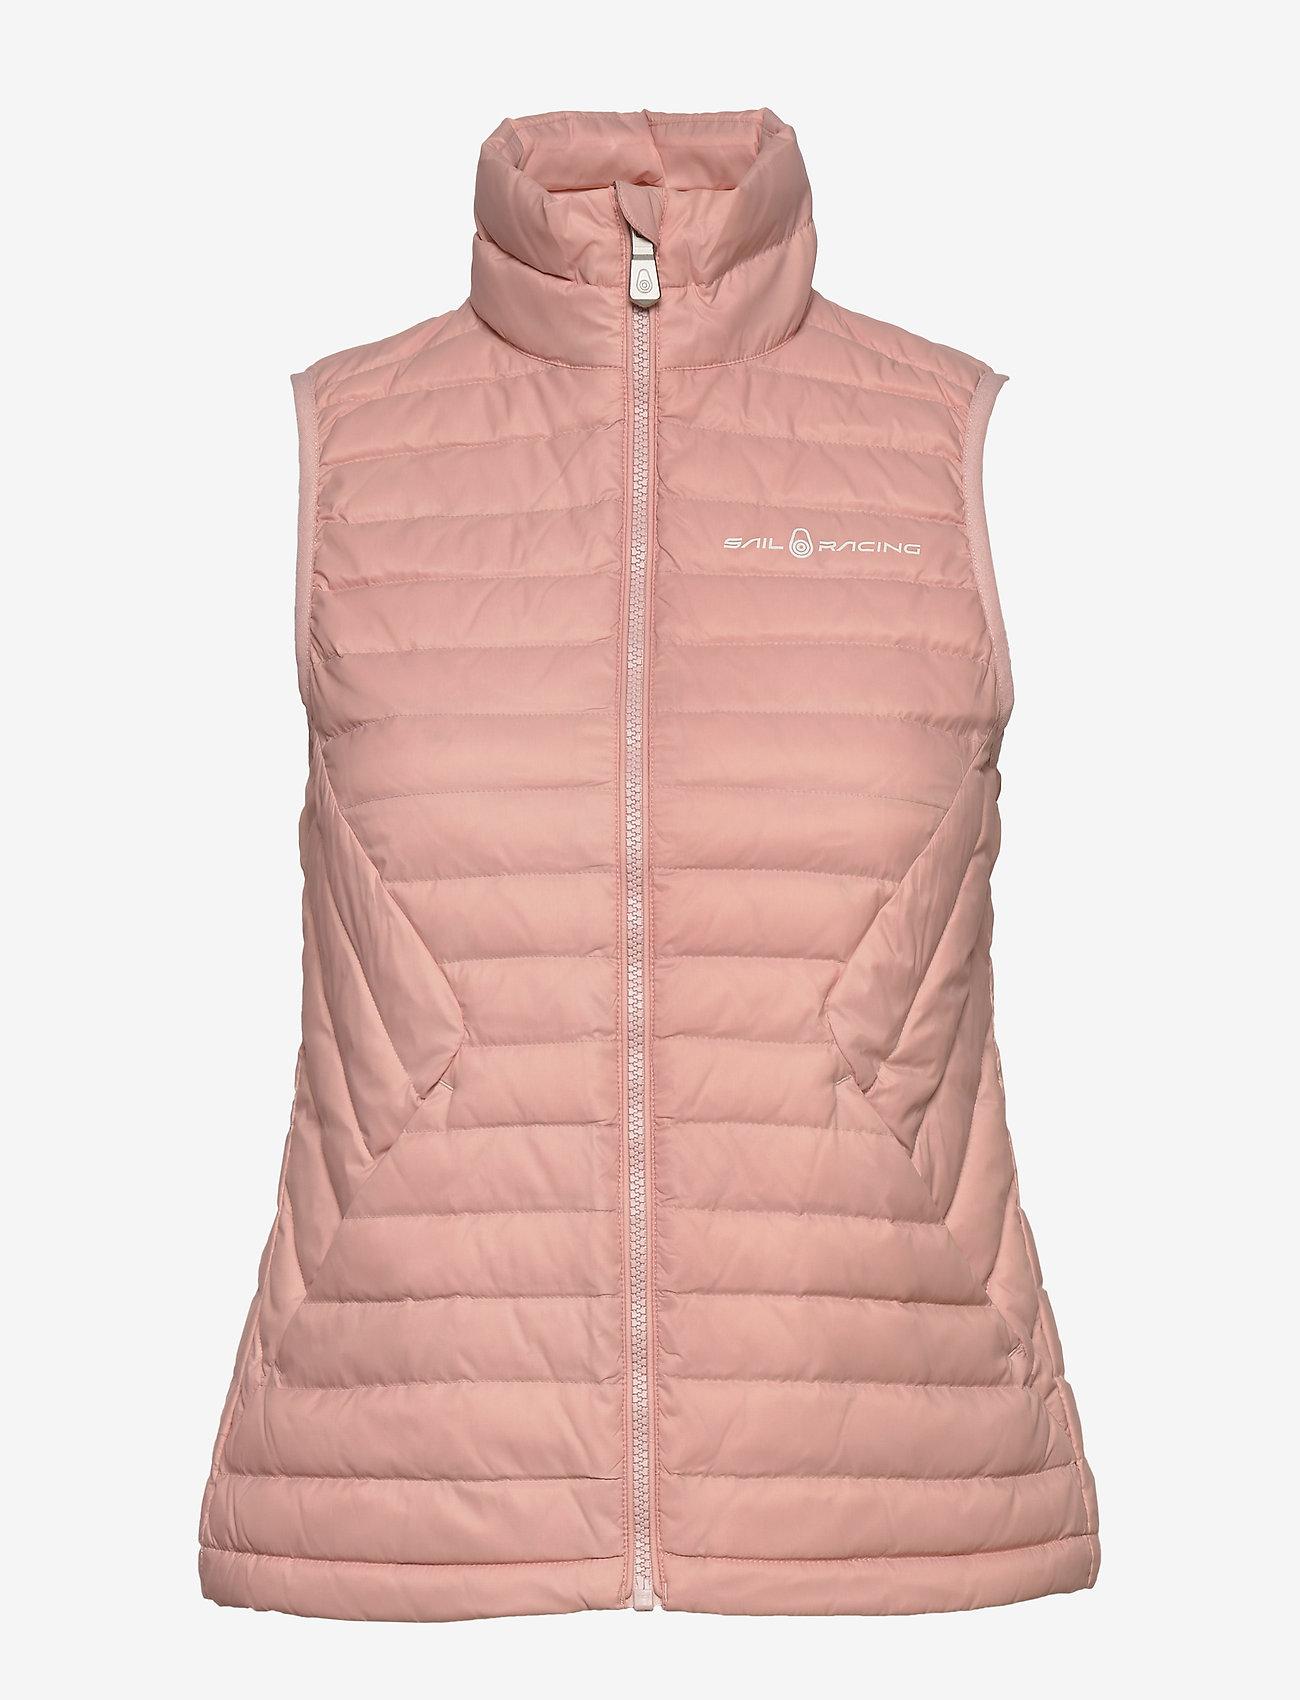 Sail Racing - W LINK DOWN VEST - puffer vests - dusky pink - 1